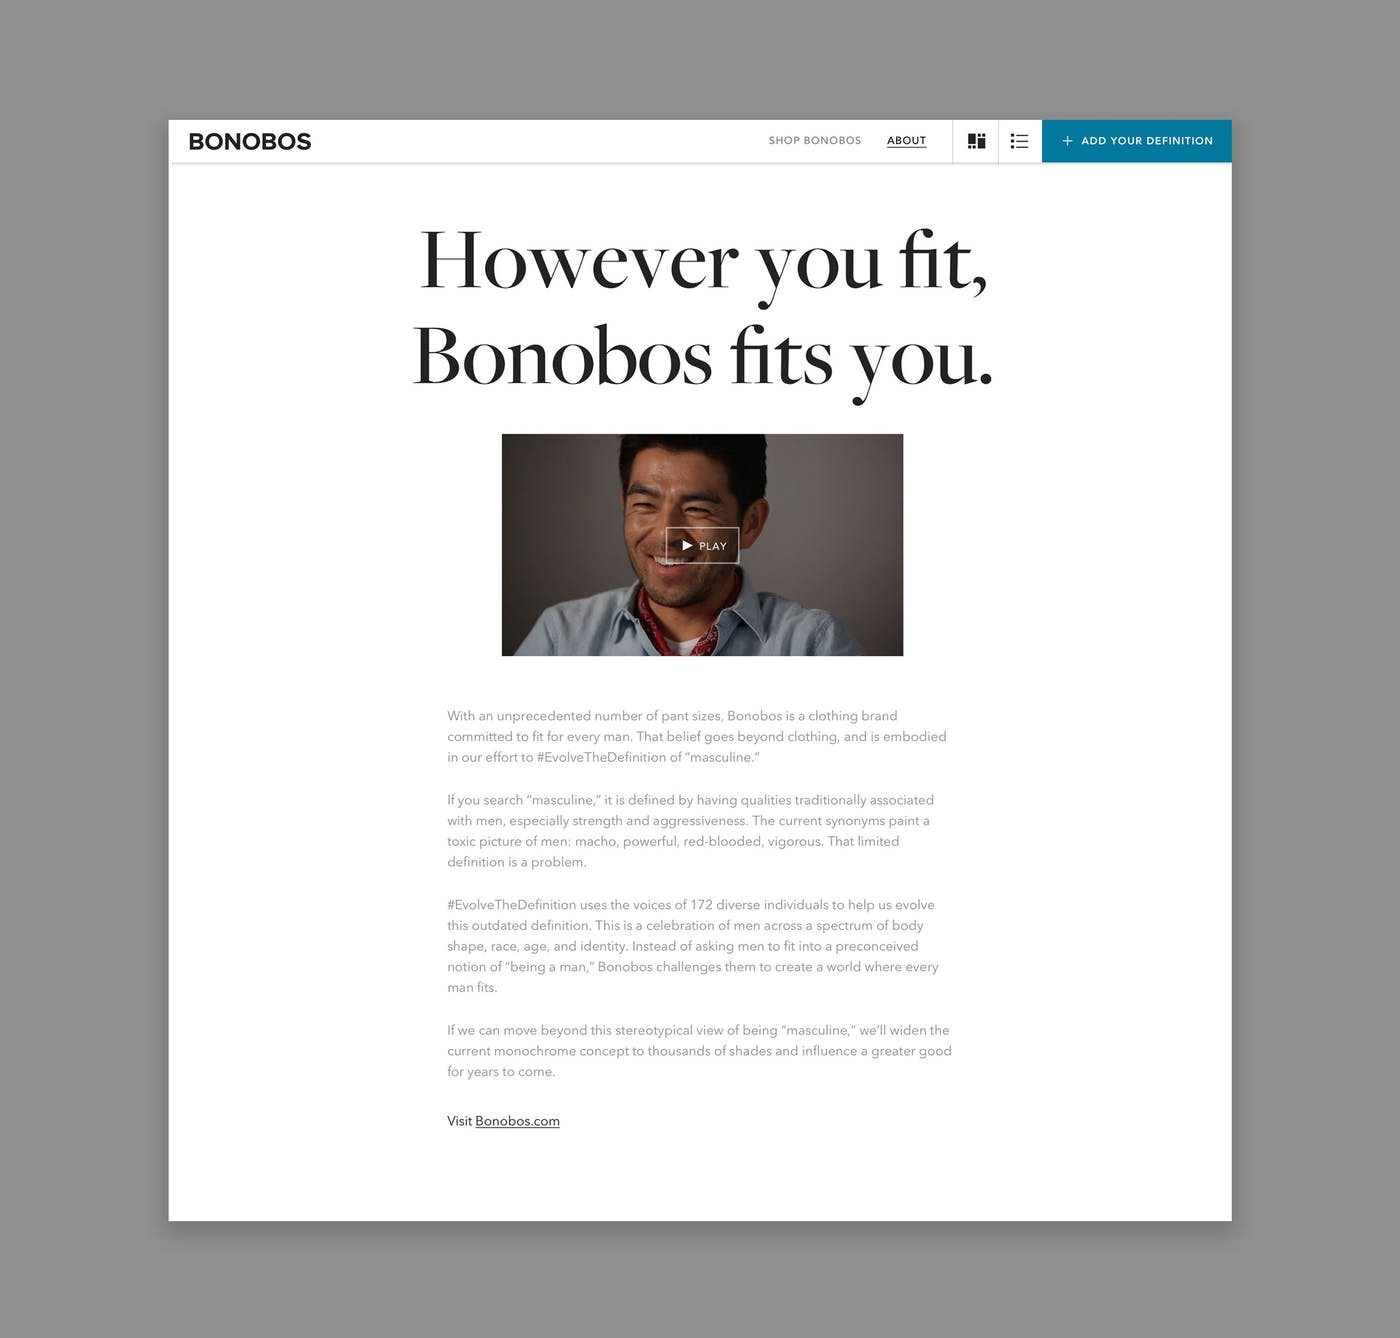 Screenshot of blog post page of Bonobos project.